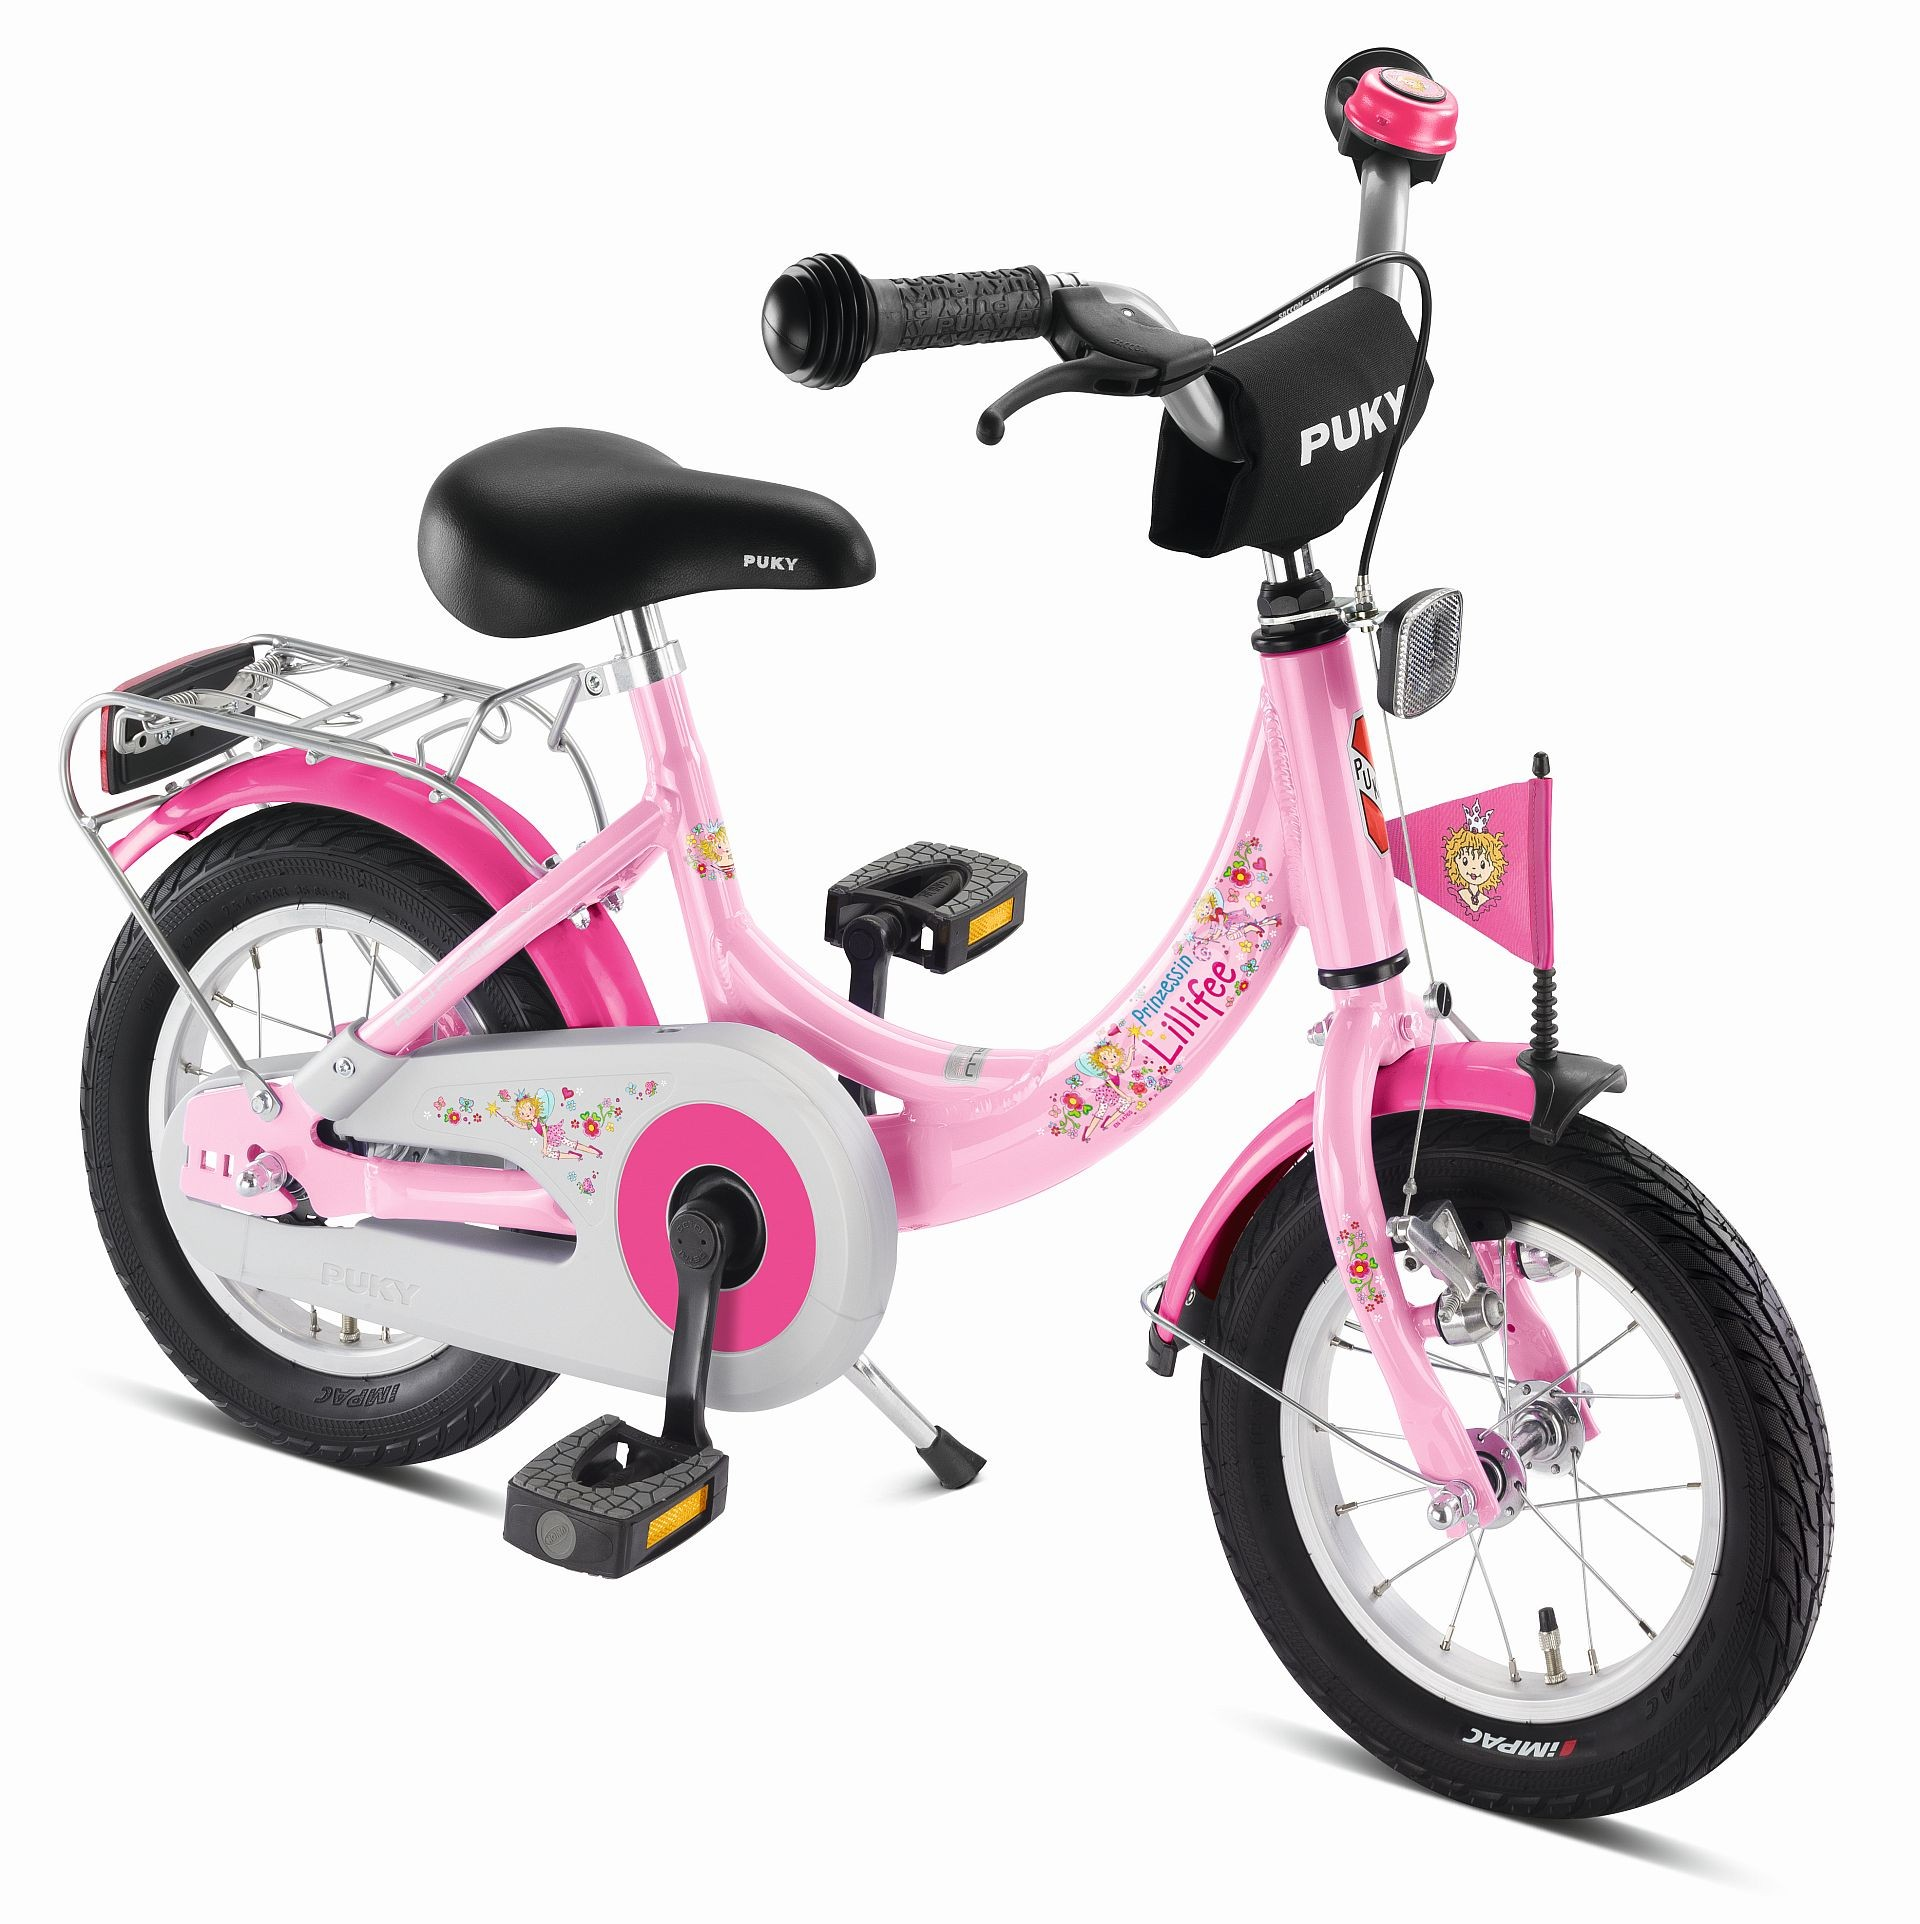 Puky Fahrrad ZL 12 Alu Lillifee